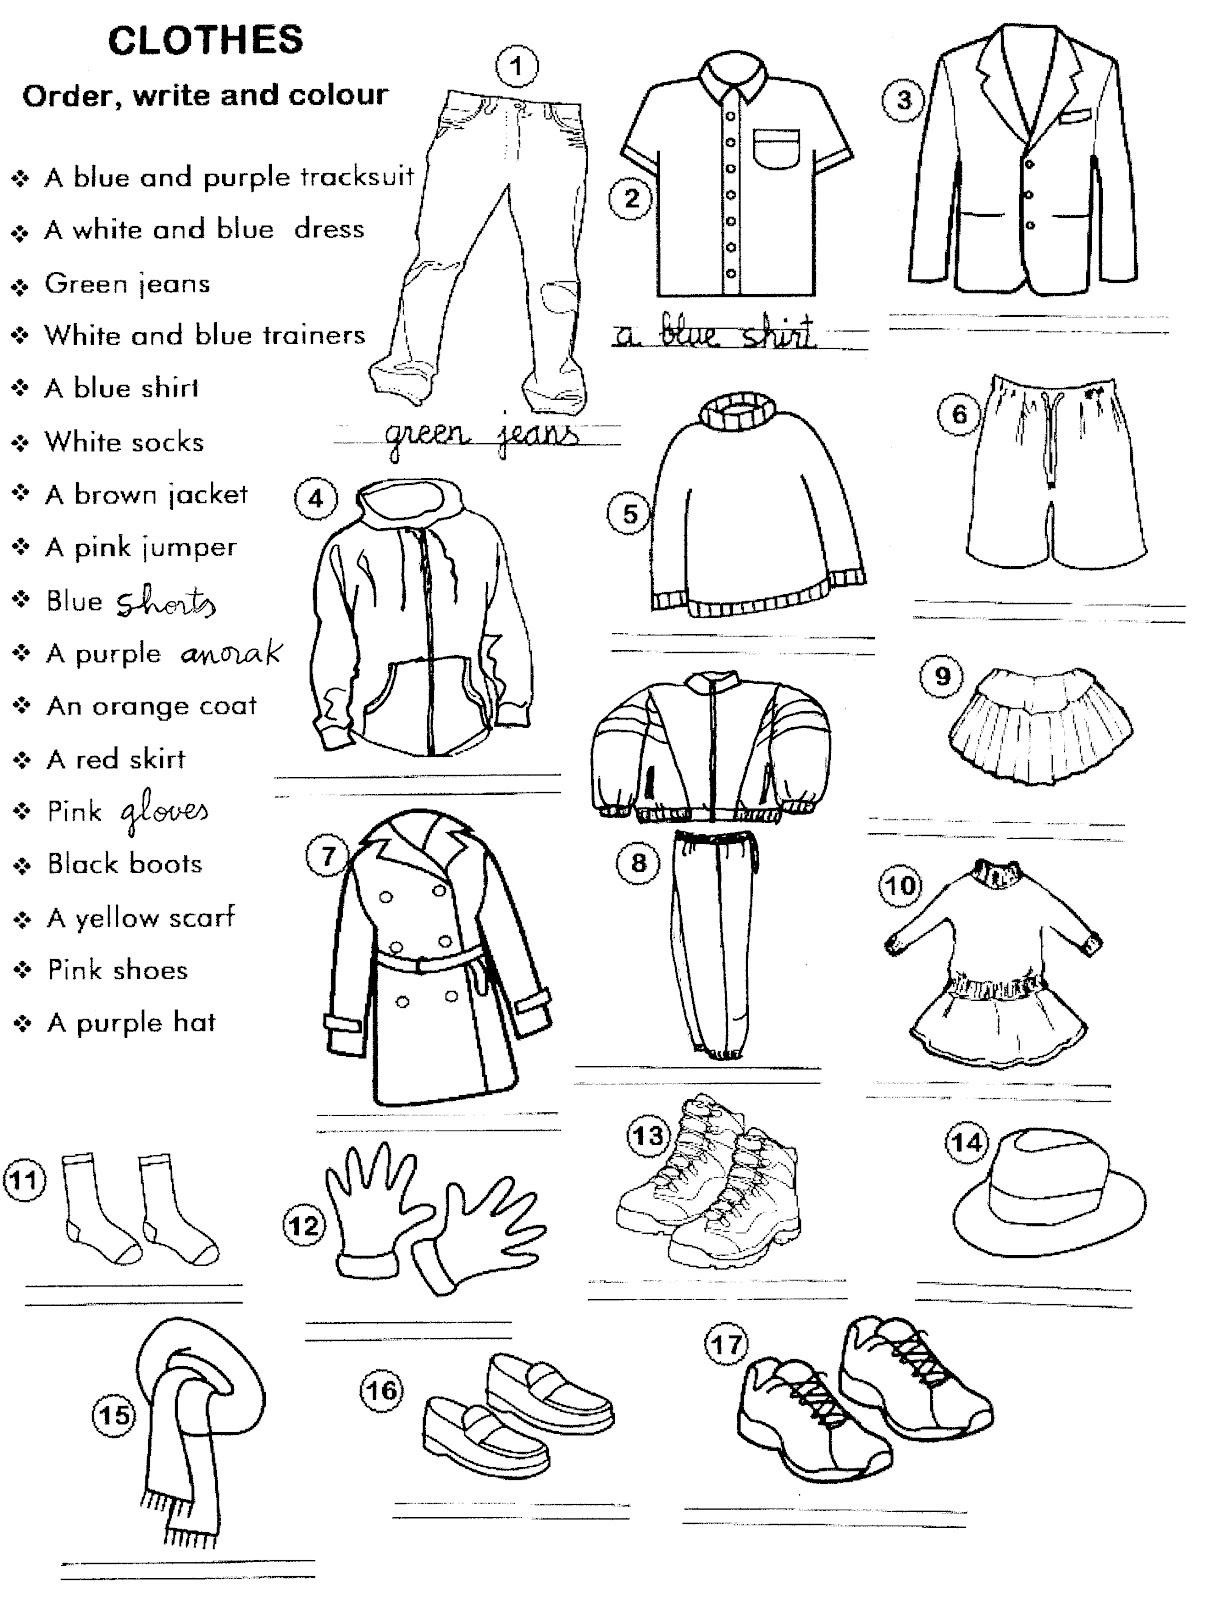 http://1.bp.blogspot.com/-QI3TAaSCFPs/TzveUypUP4I/AAAAAAAAAUg/lsbXDGpkPLw/s1600/Clothes%2Bactivity.JPG